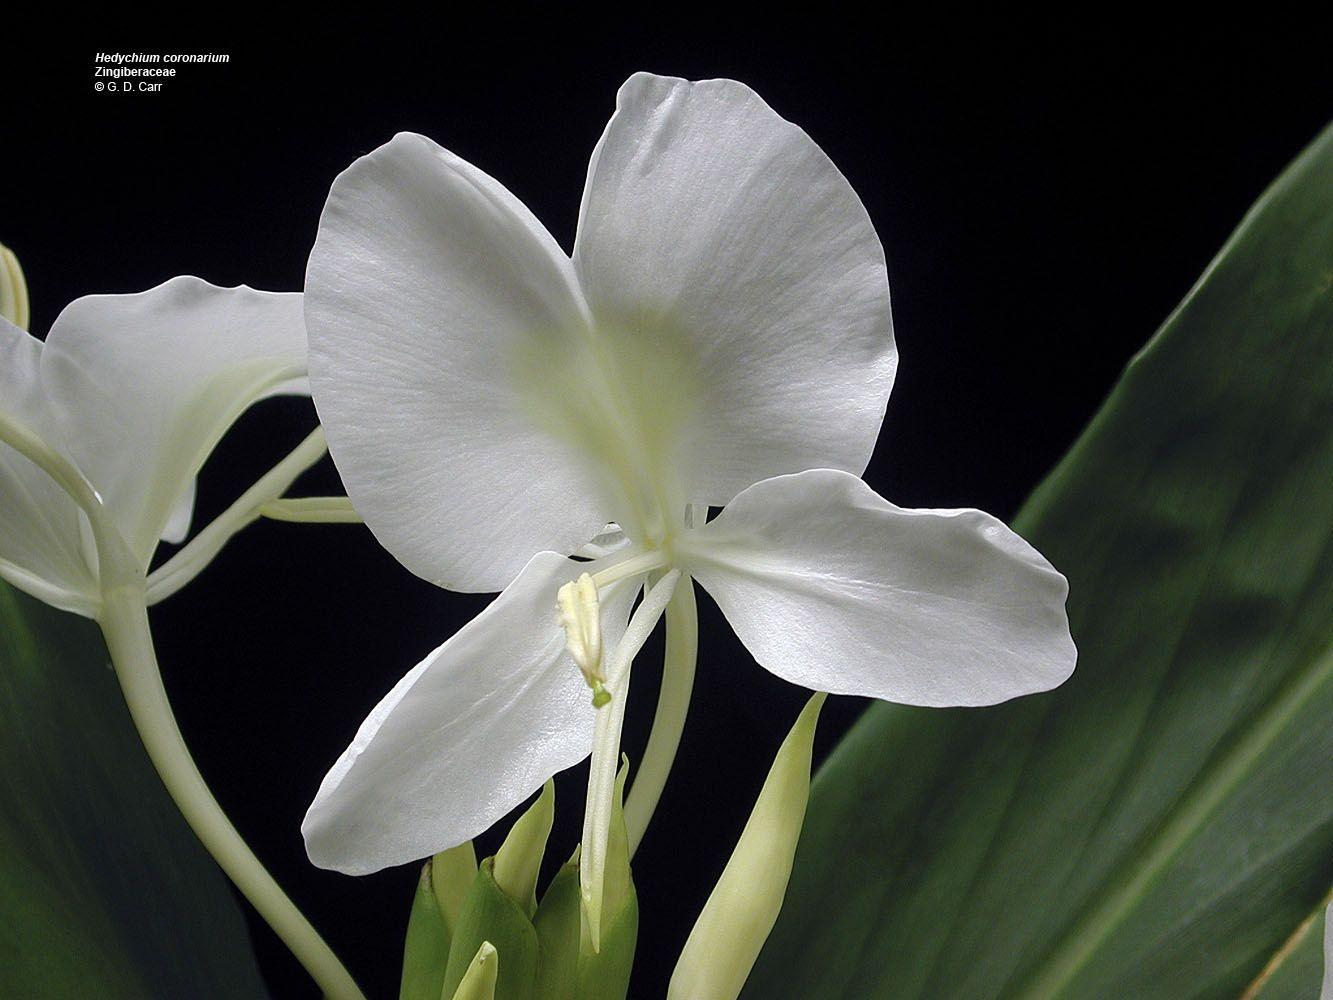 Hedychium Coronarium Zingiberaceae Butterfly Lily Ginger Lily Awapuhi Ke Oke O White Ginger A Del Ginger Flower Unusual Flowers White Flowering Plants